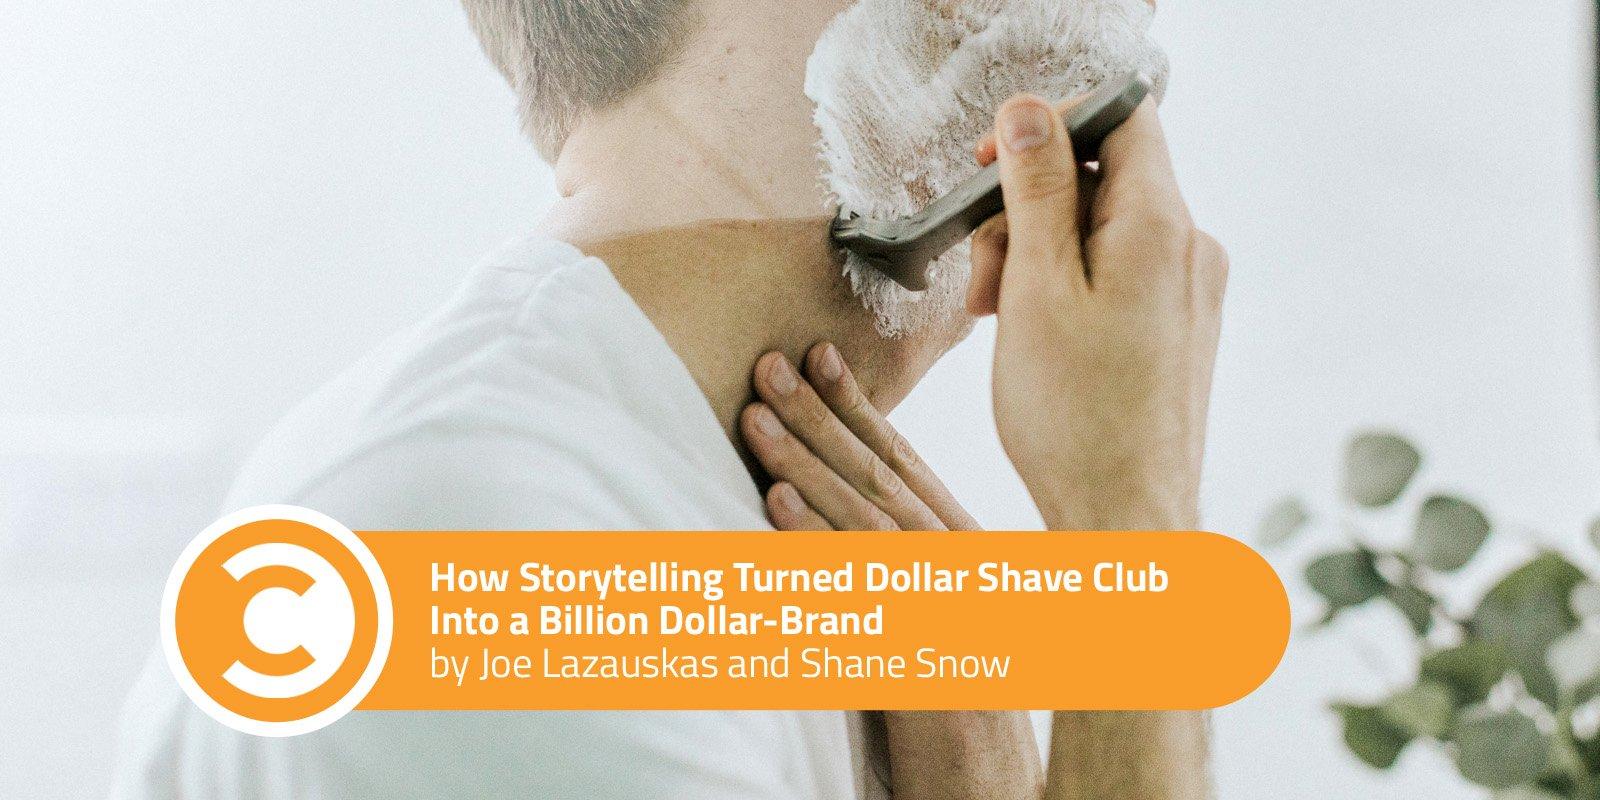 How Storytelling Turned Dollar Shave Club Into a Billion Dollar-Brand